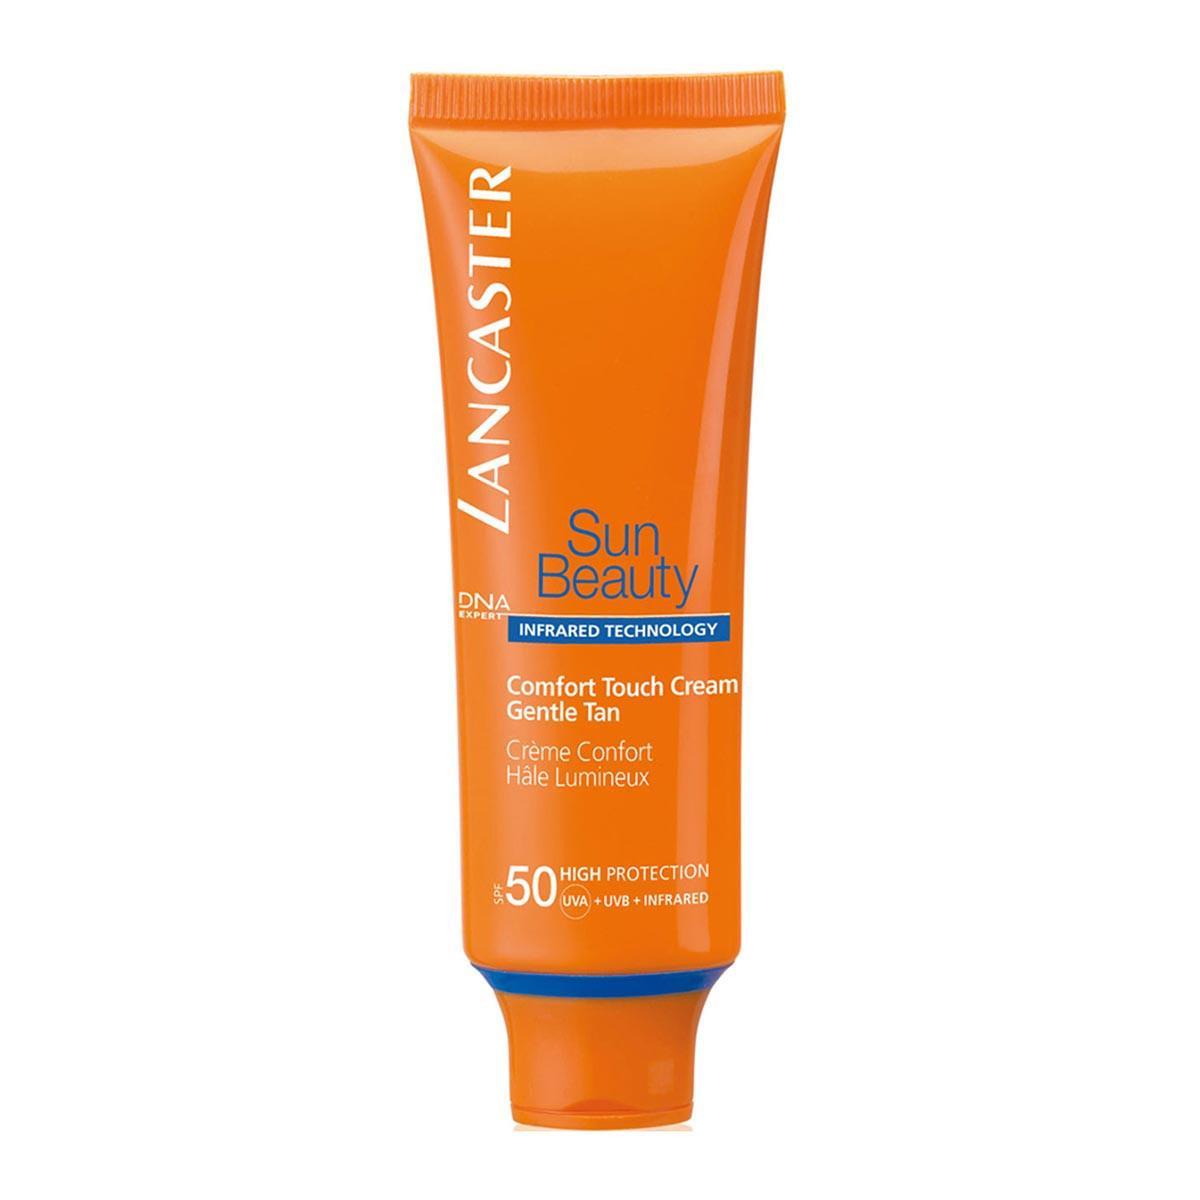 Cosm?tica facial Lancaster Solar Sunbeauty Cream Spf50 50 Ml